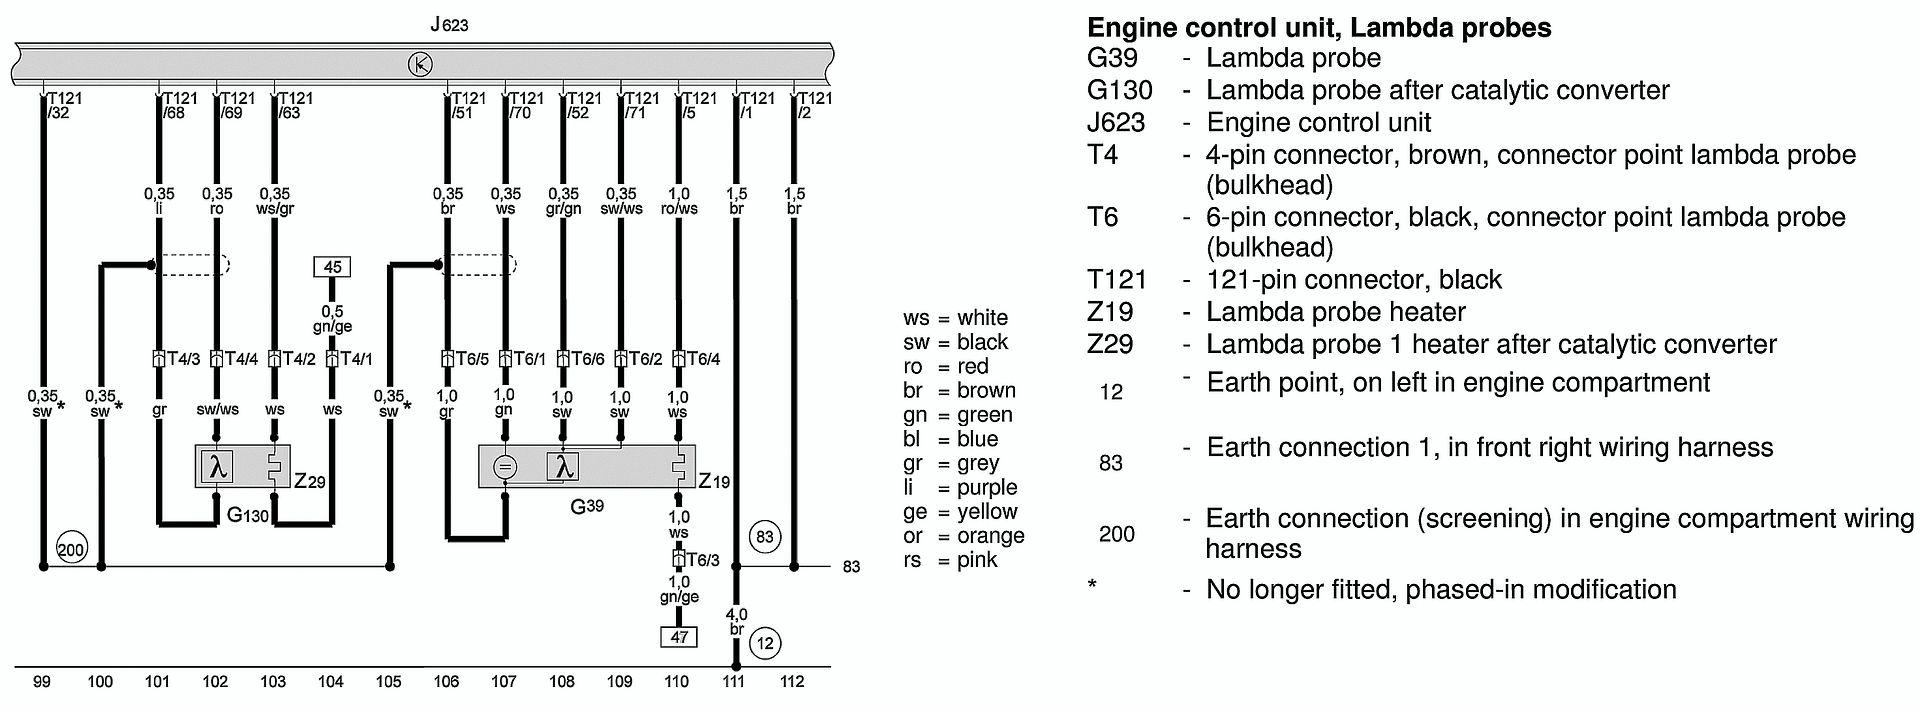 2004 Vw Passat 1.8t O2 Sensor Wiring Diagram